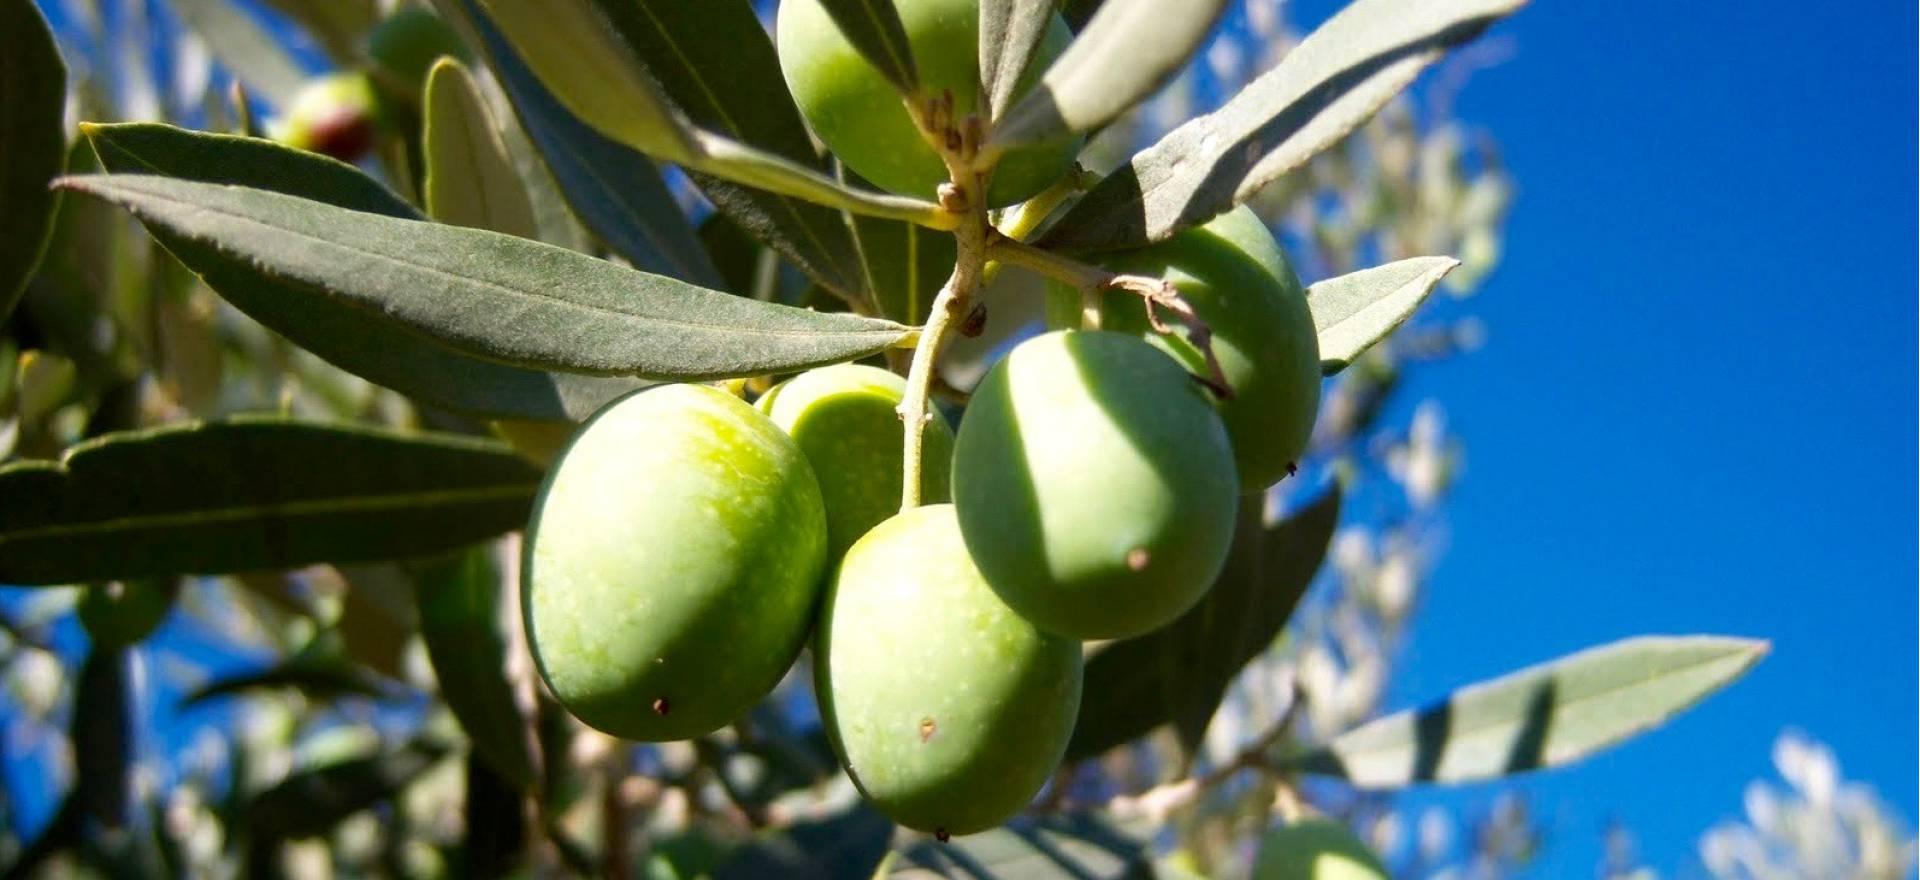 Agriturismo Sicilie Gemoedelijke agriturismo in Sicilie met restaurant